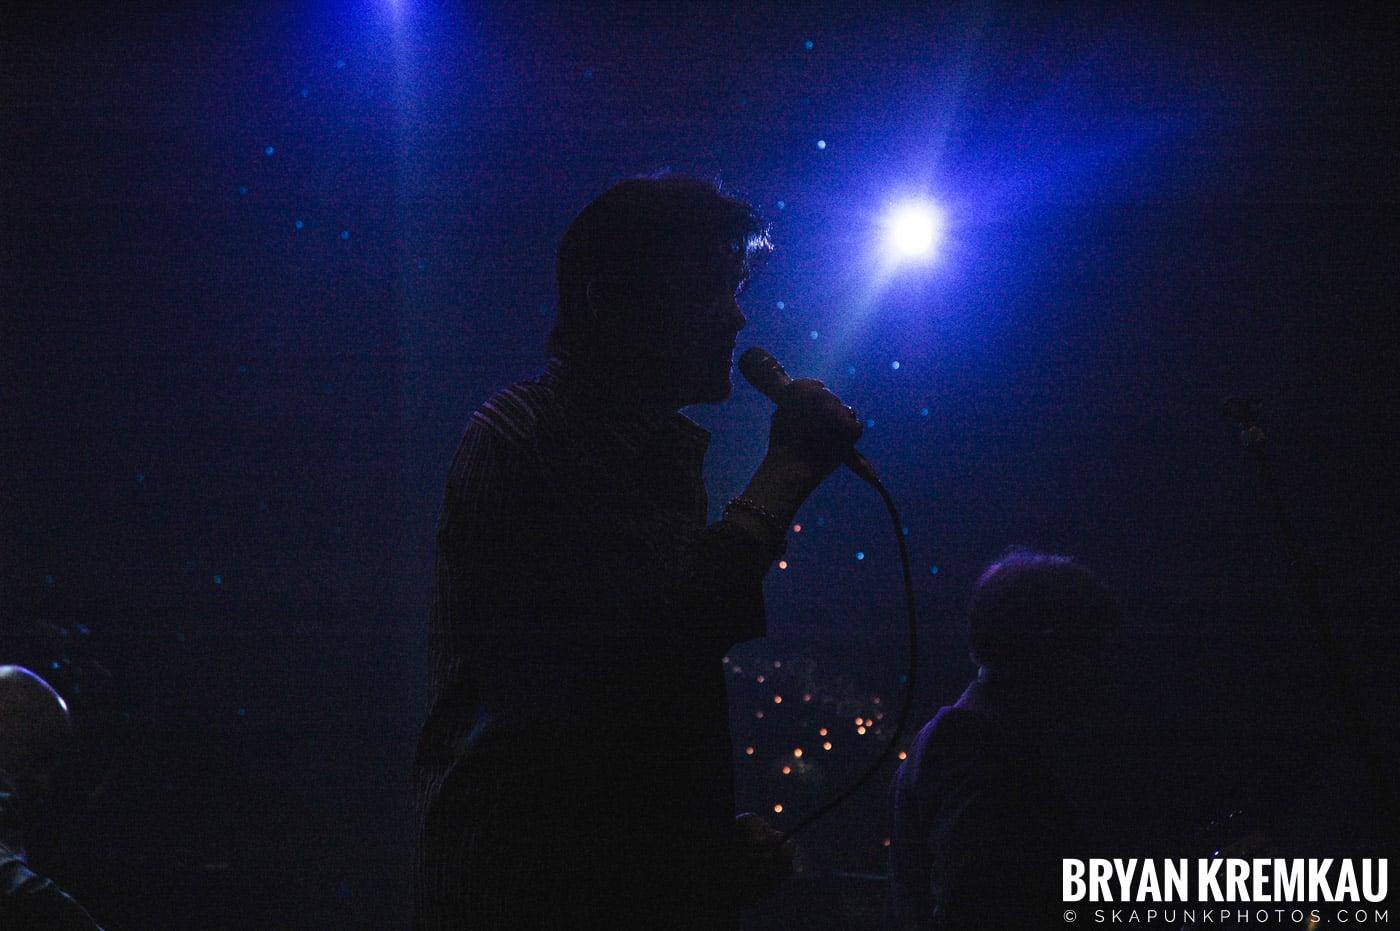 The Pogues @ Brixton Academy, London UK - 12.19.05 (13)